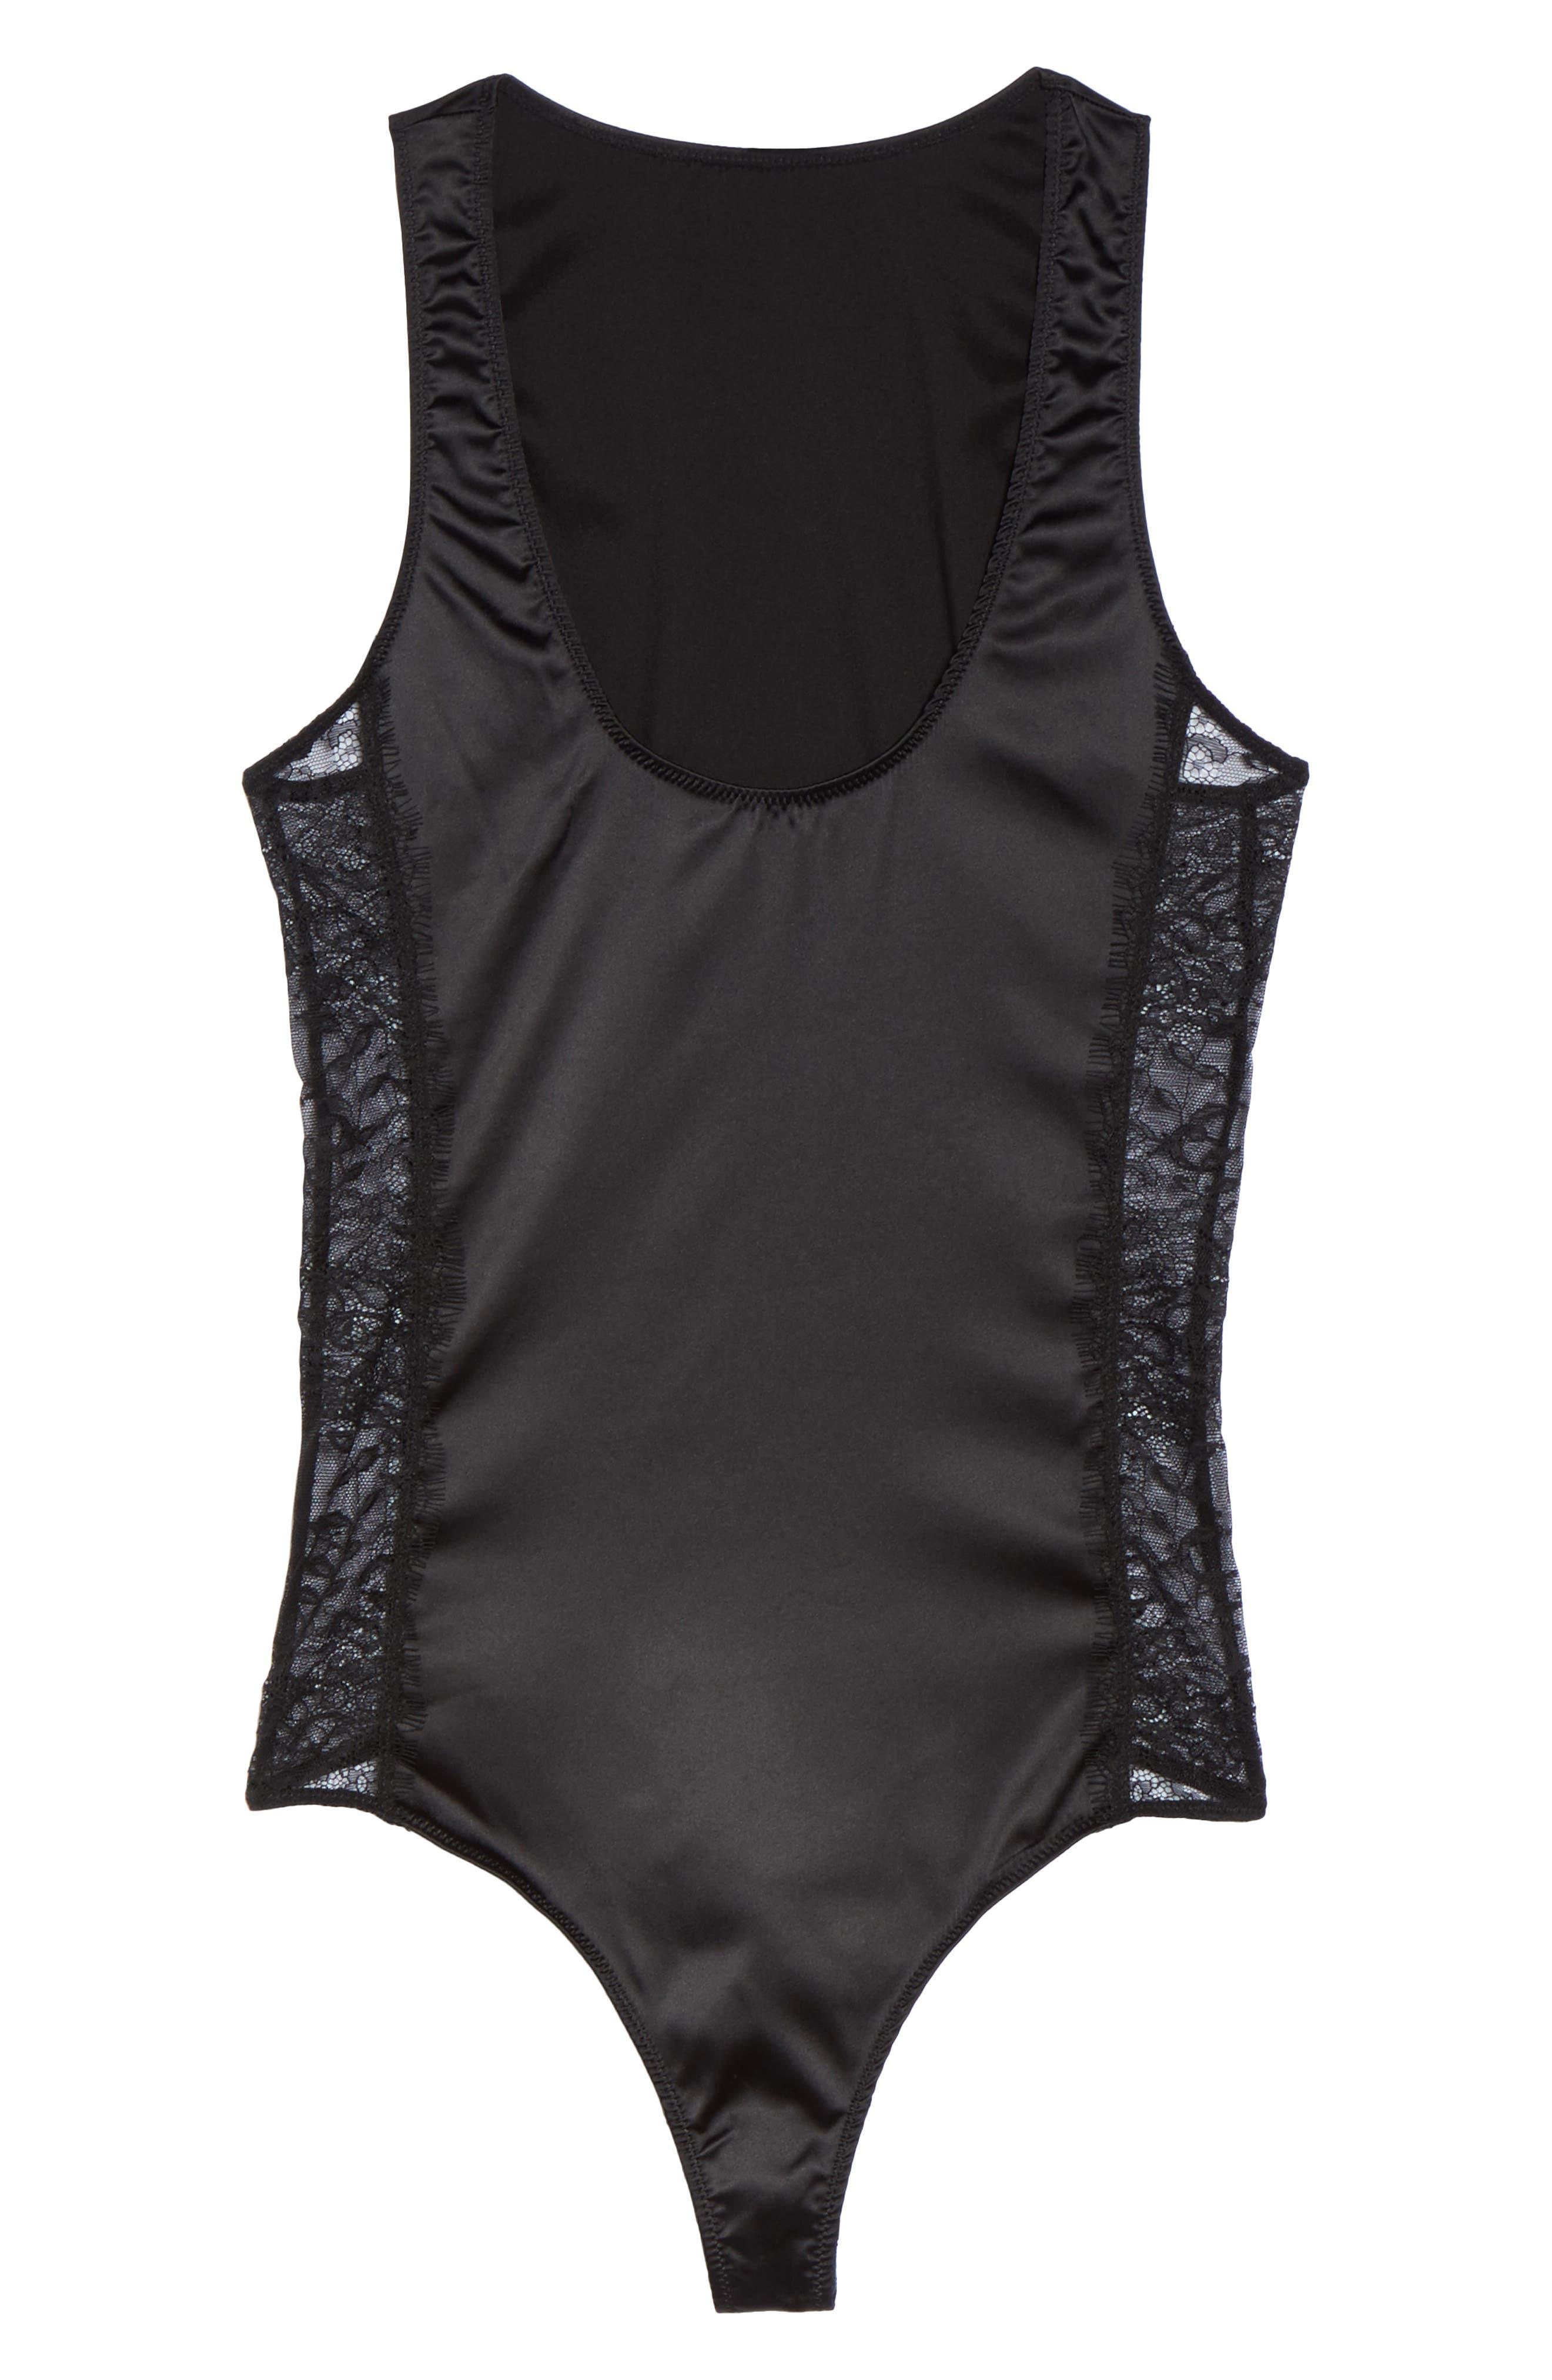 Thong Bodysuit,                             Alternate thumbnail 4, color,                             Black